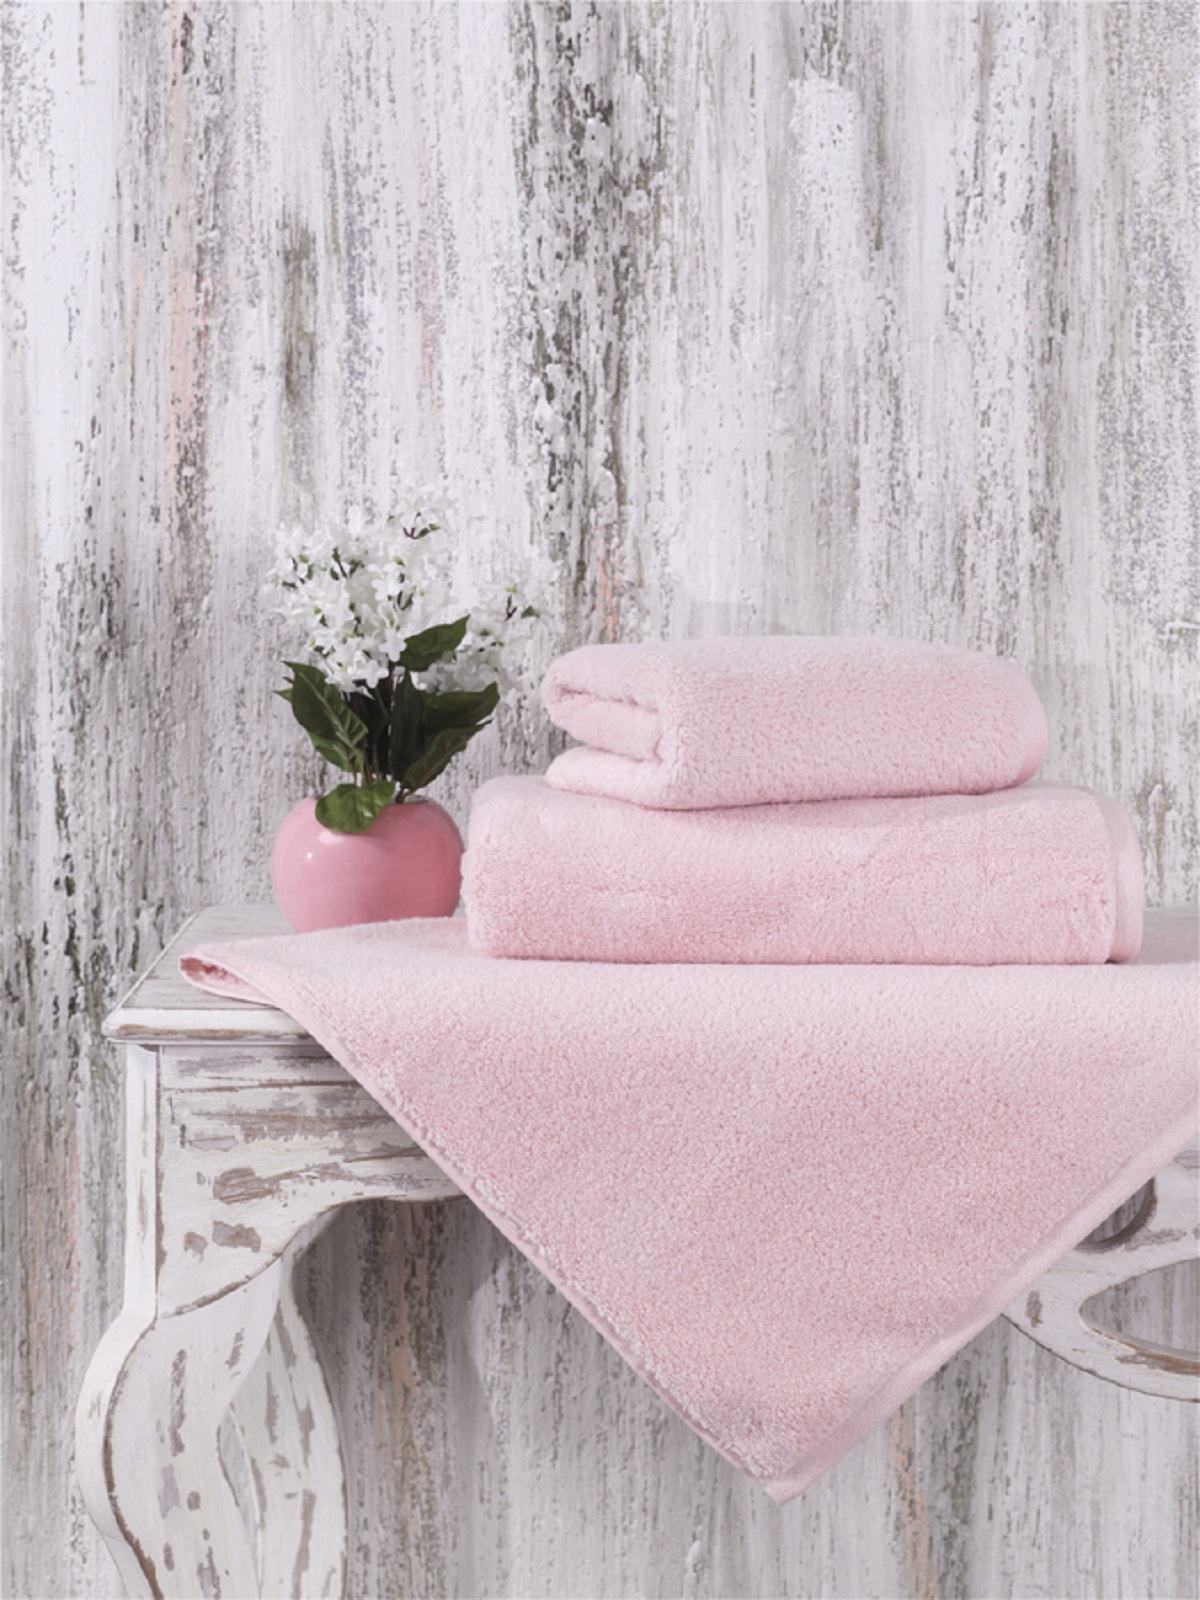 Купить Полотенца Karna, Полотенце Mora Цвет: Пудра (90х150 см), Турция, Розовый, Махра